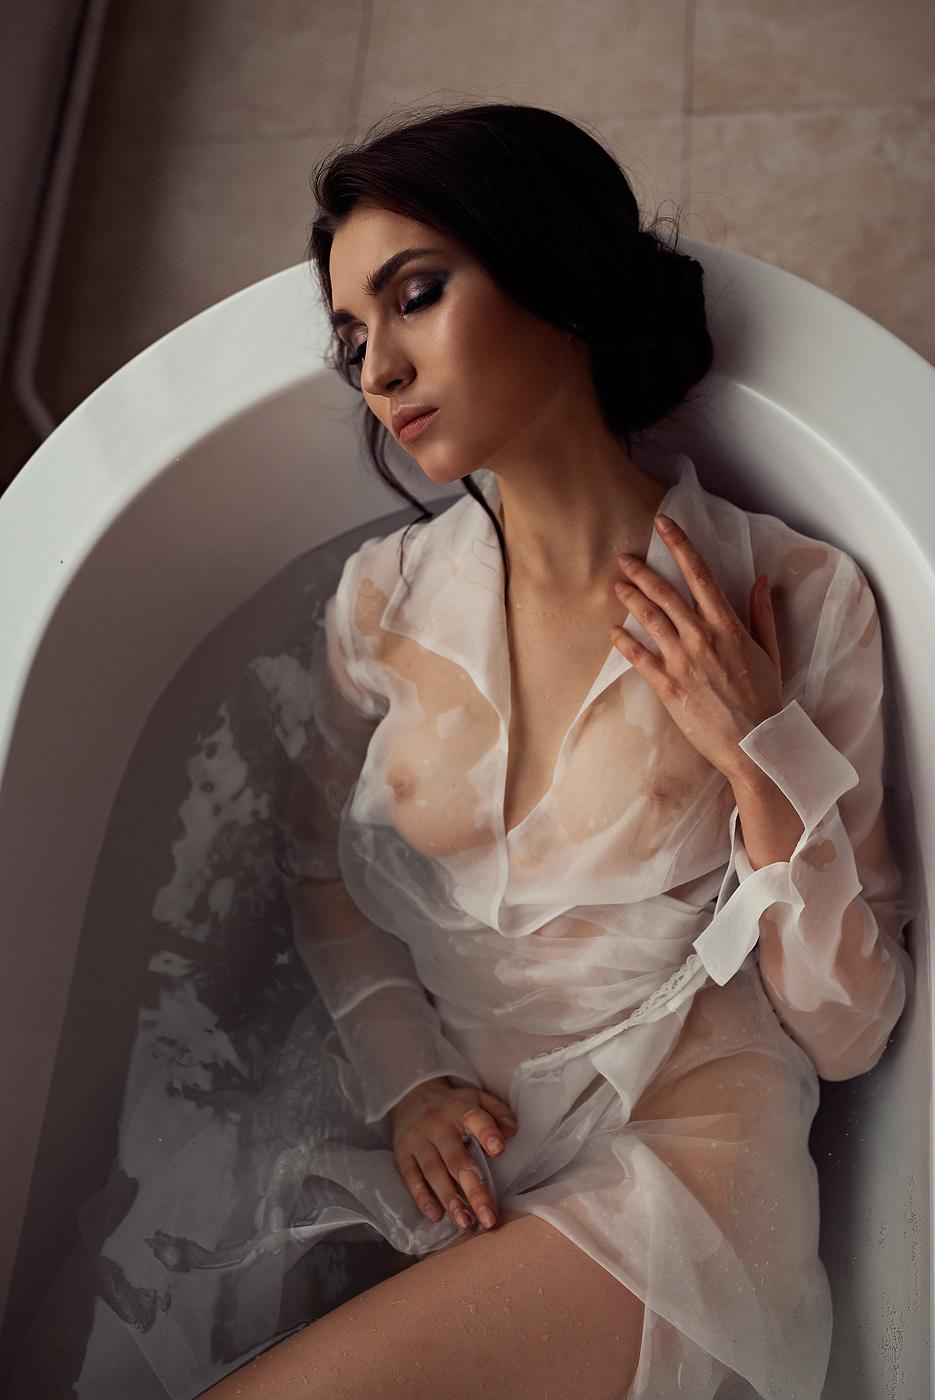 Bath / фотограф Дмитрий Бугаенко модель Юлия Берданова